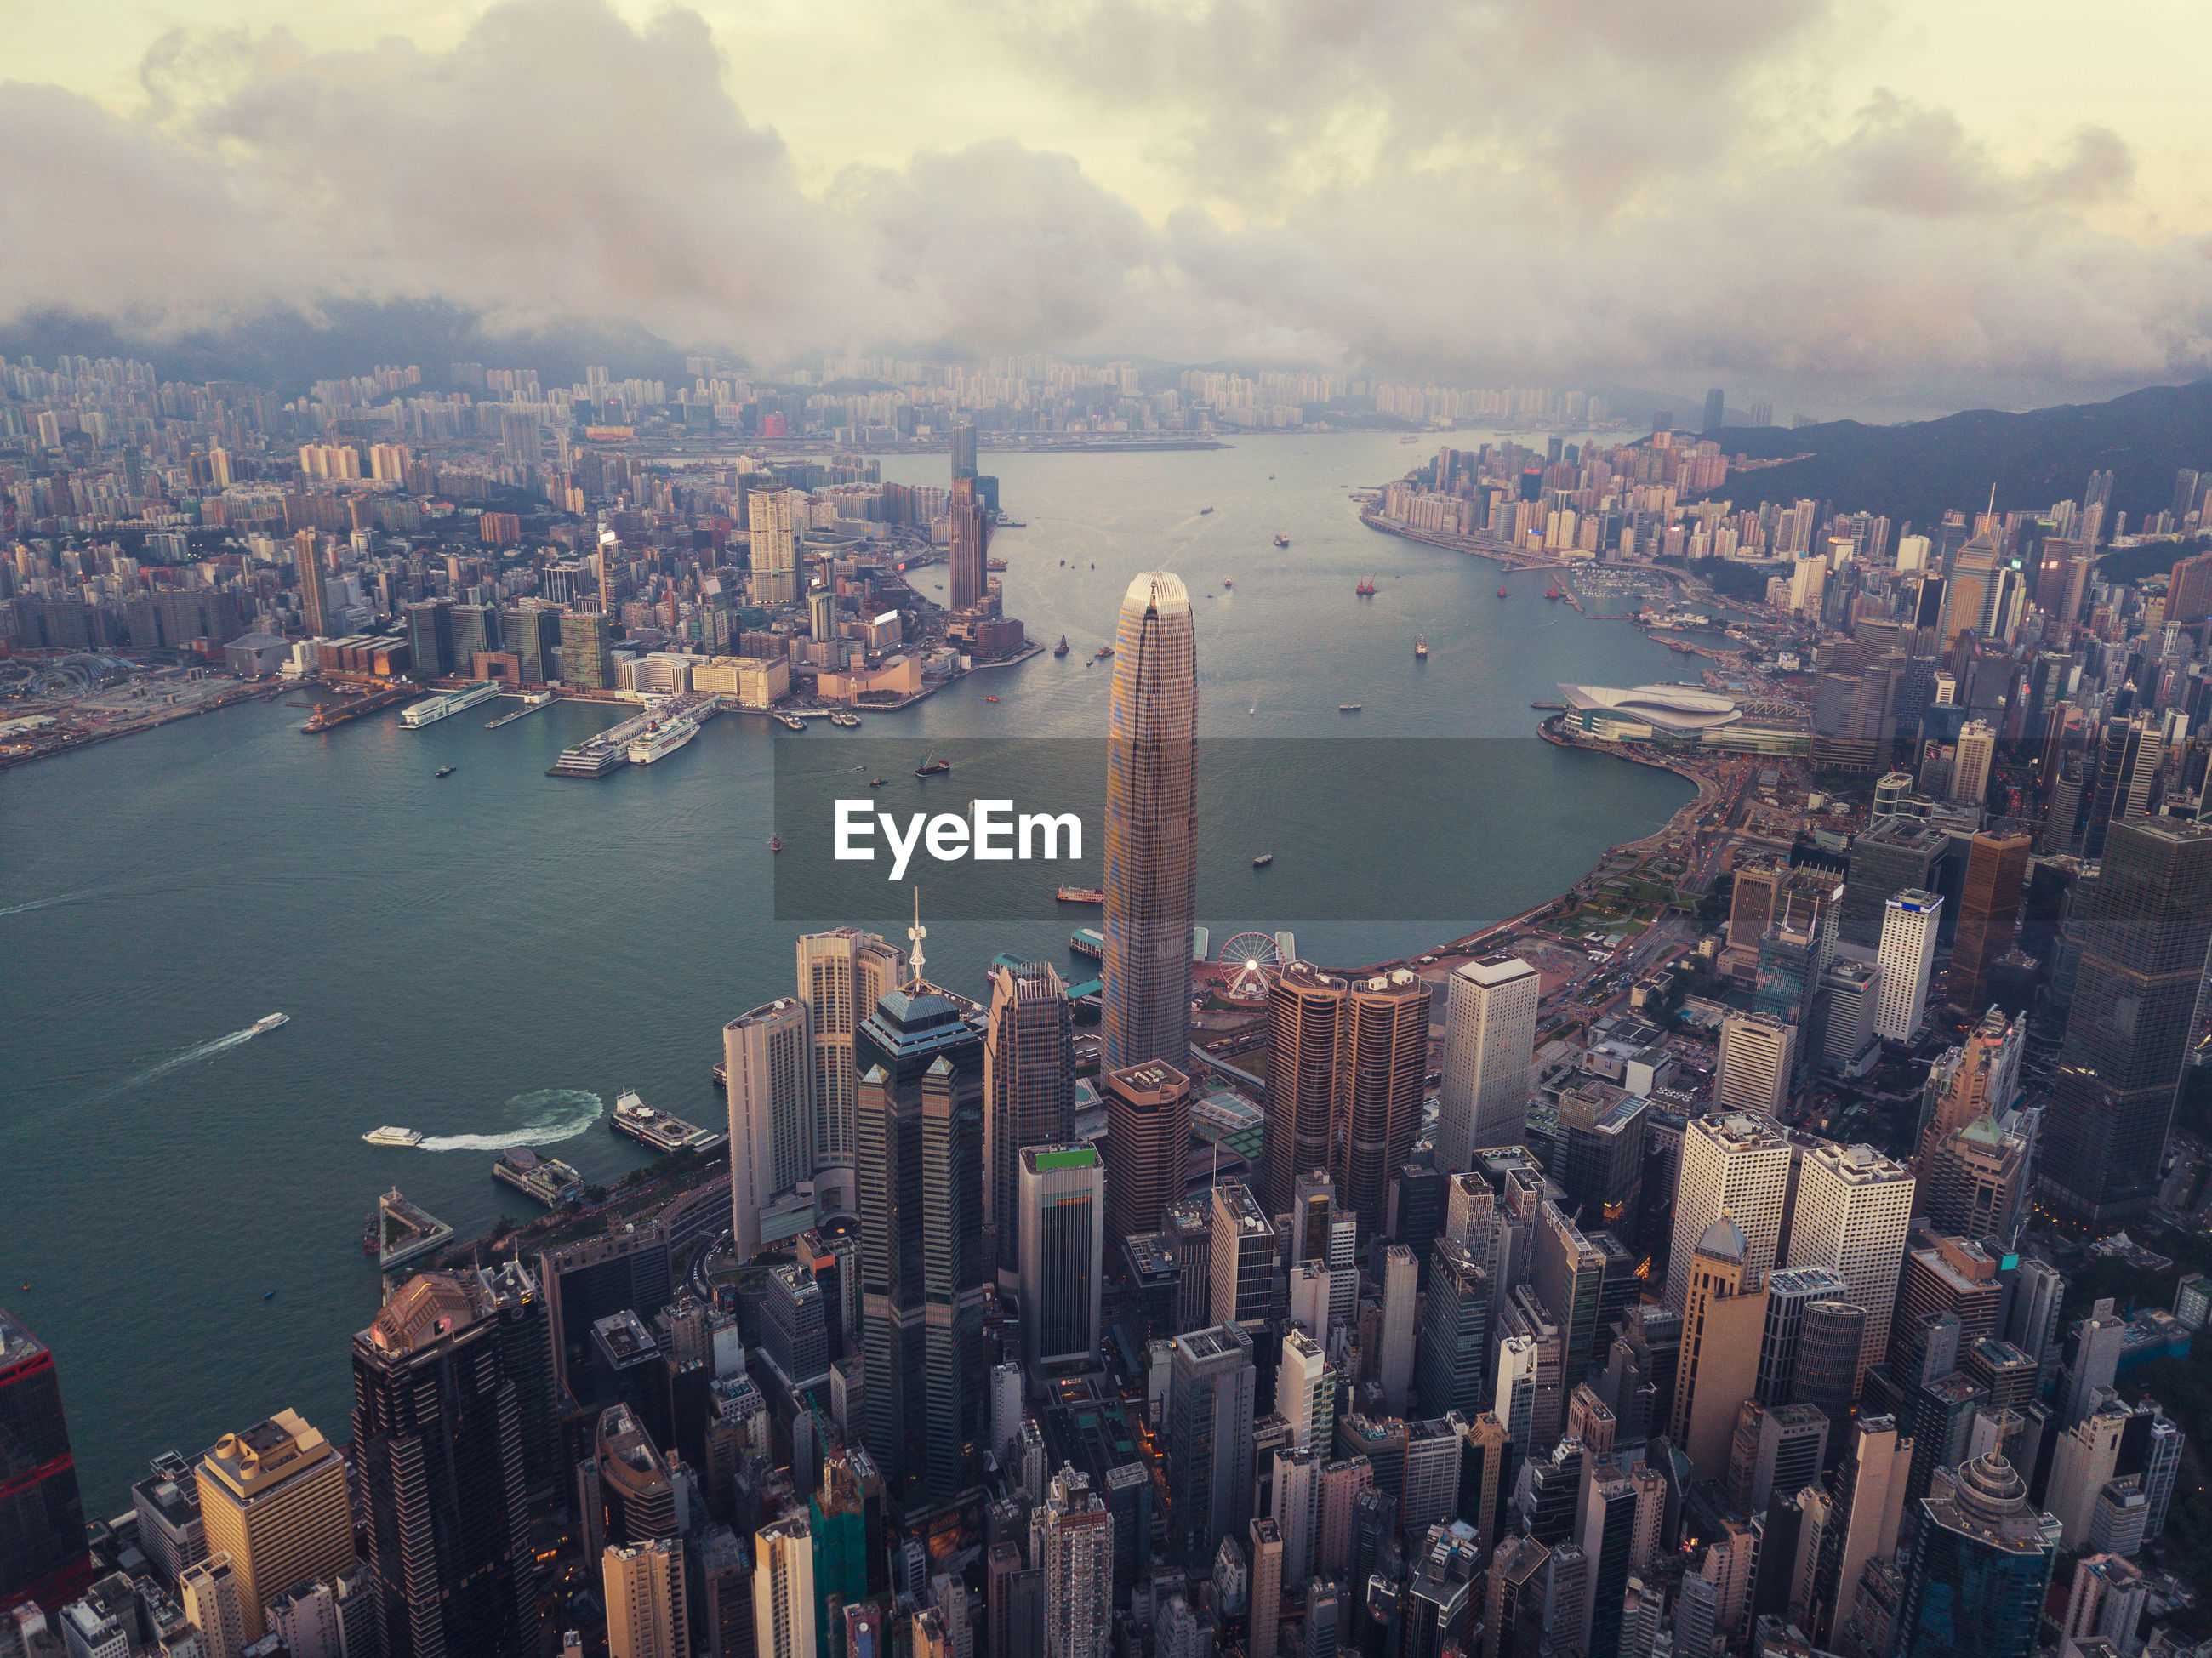 Aerial view of modern buildings in city against cloudy sky